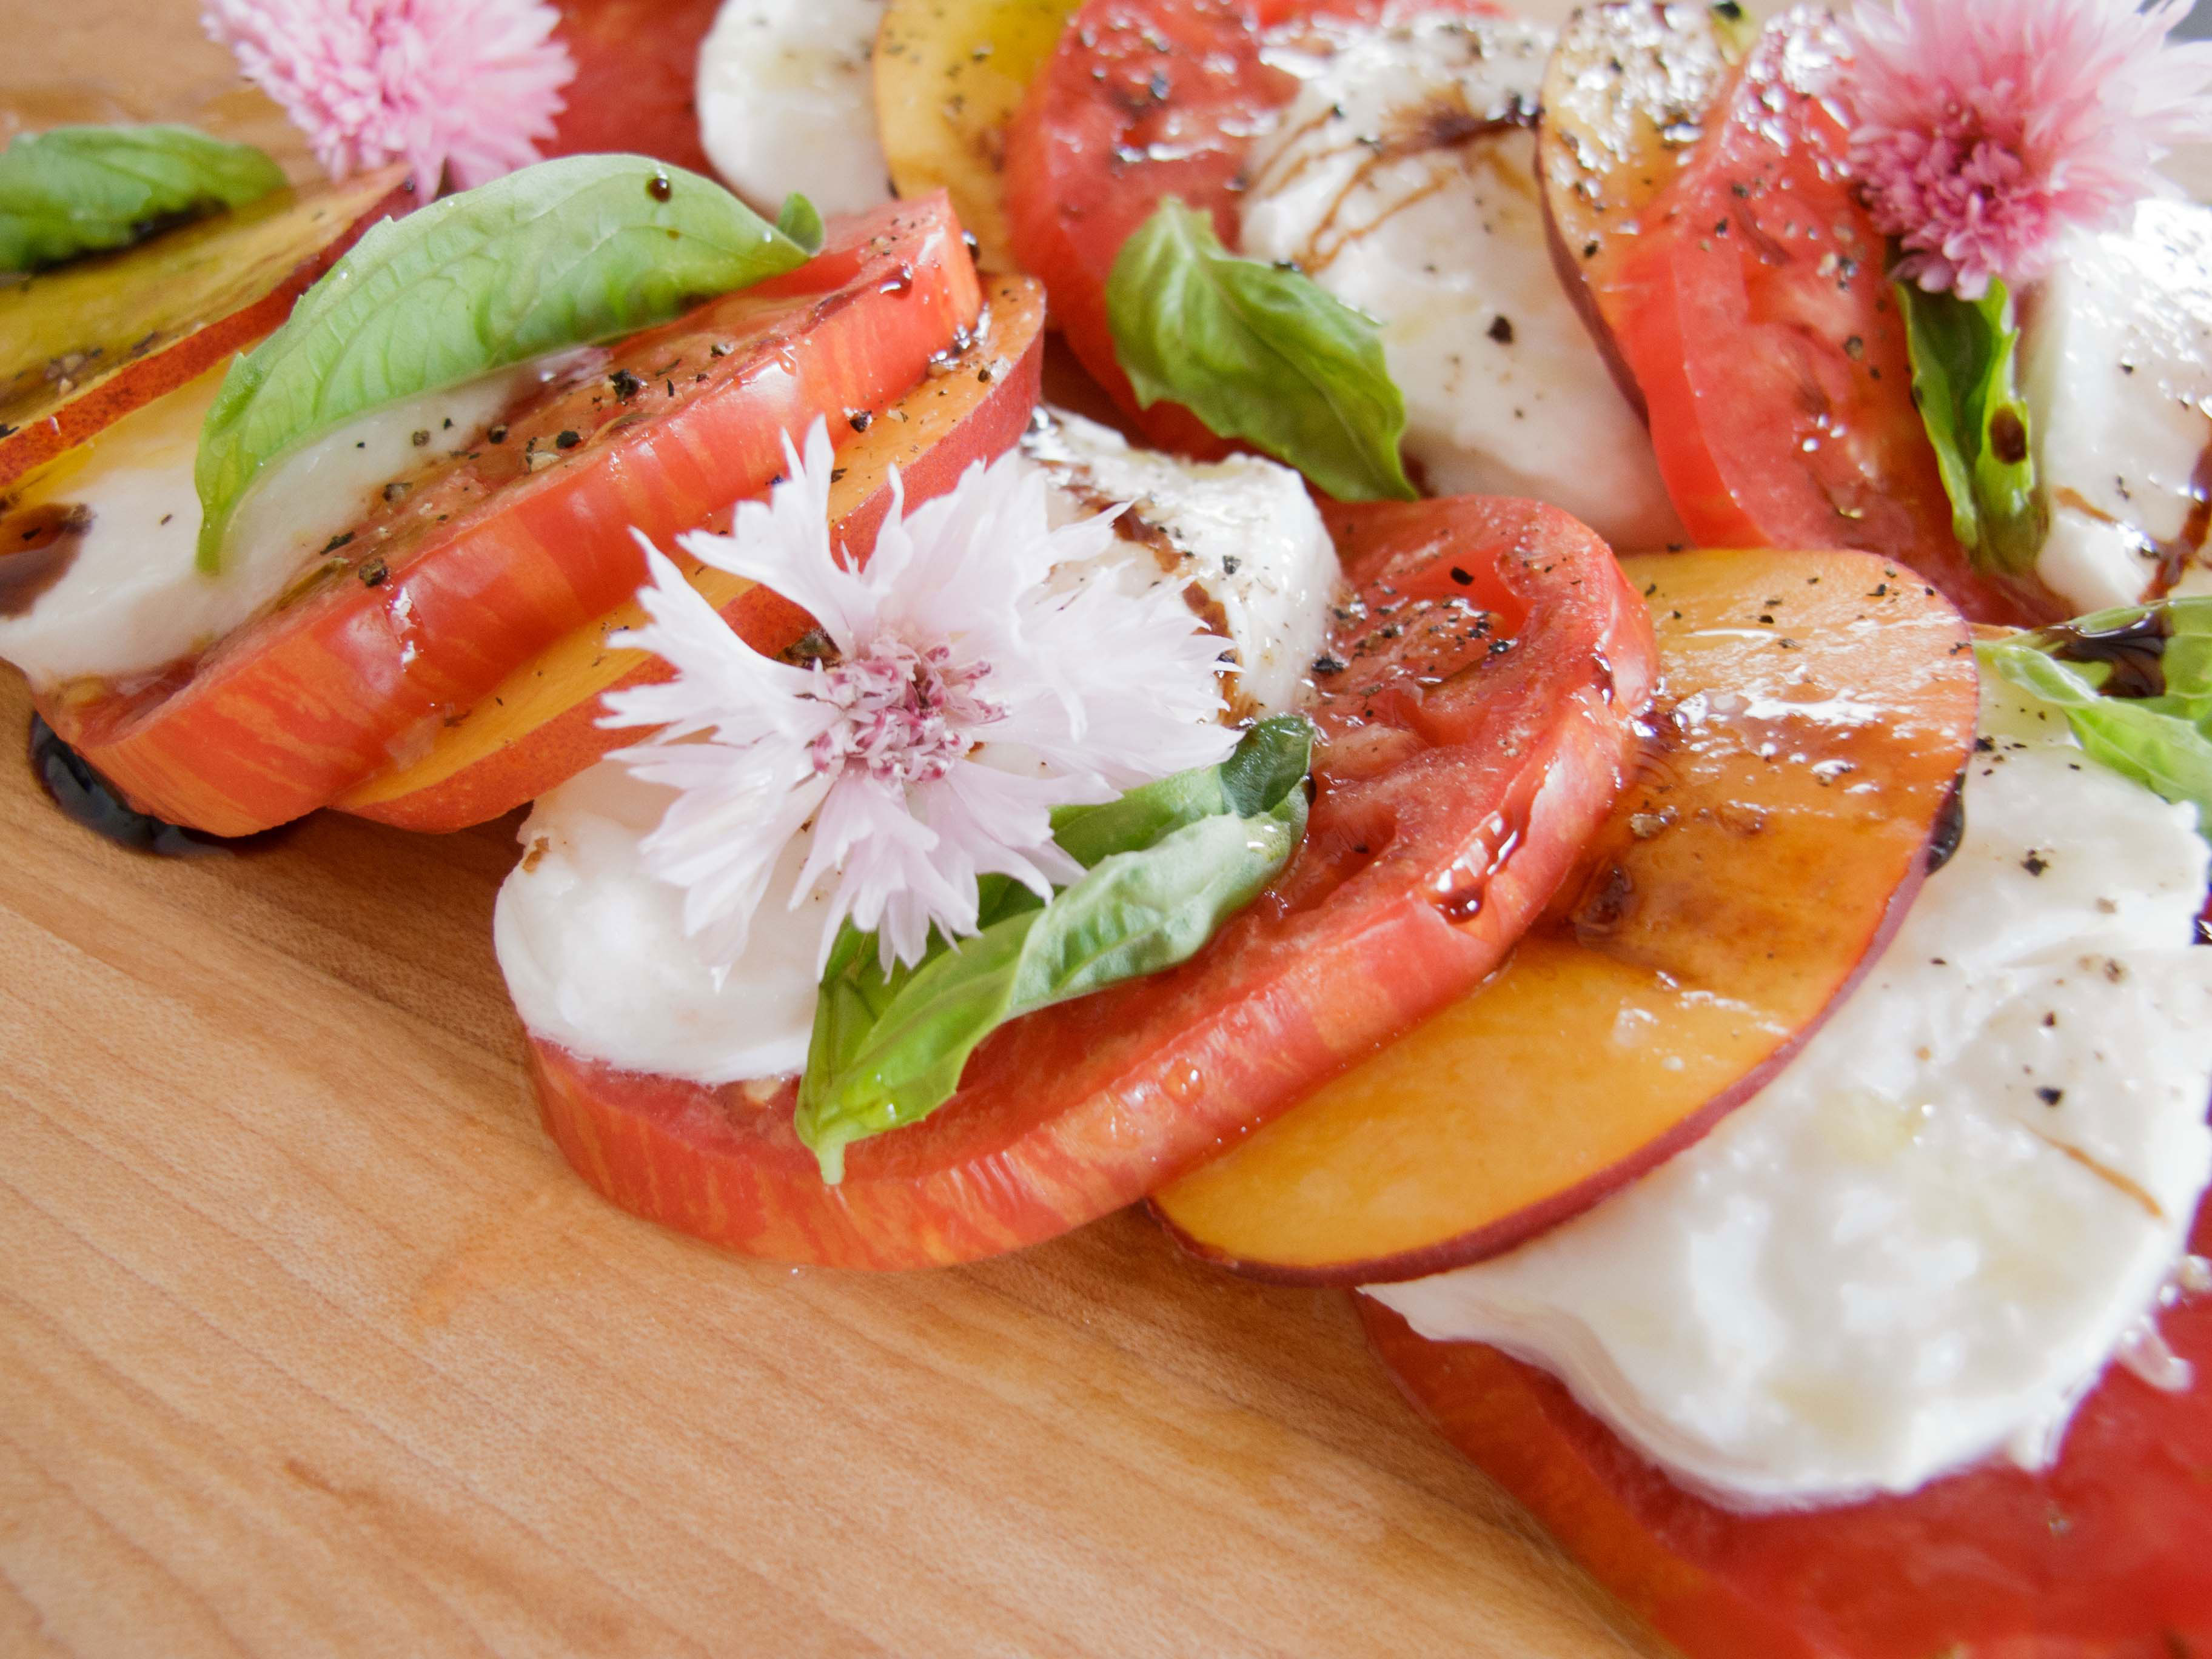 Heirloom Tomato, Nectarine, and Mozzarella Salad Recipe 0